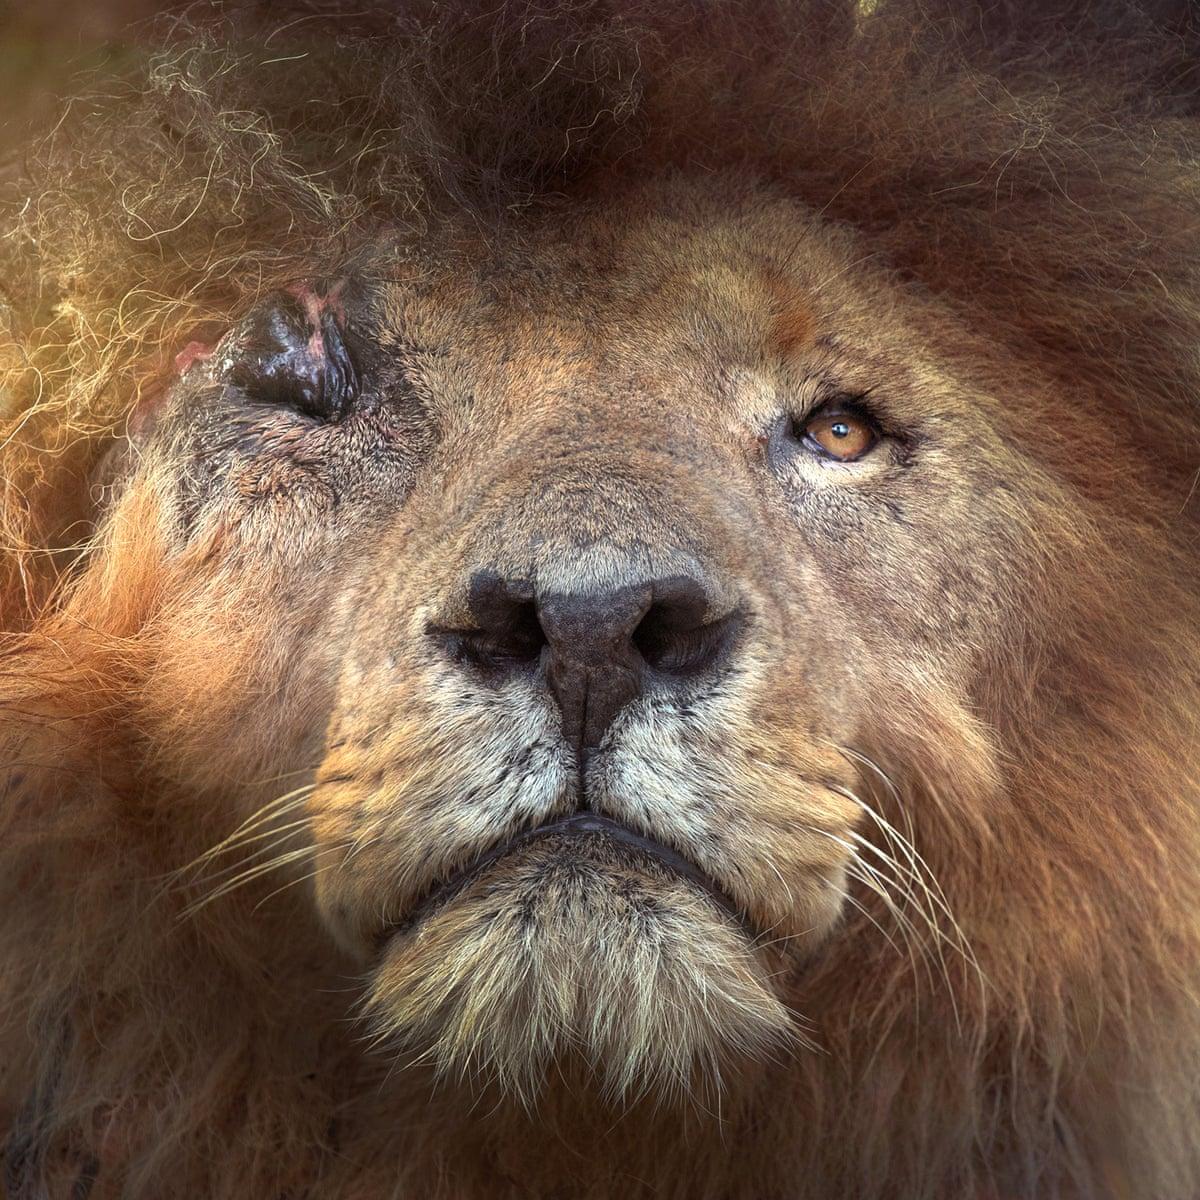 Conservationists mourn natural death of Kenyan lion Scarface ...